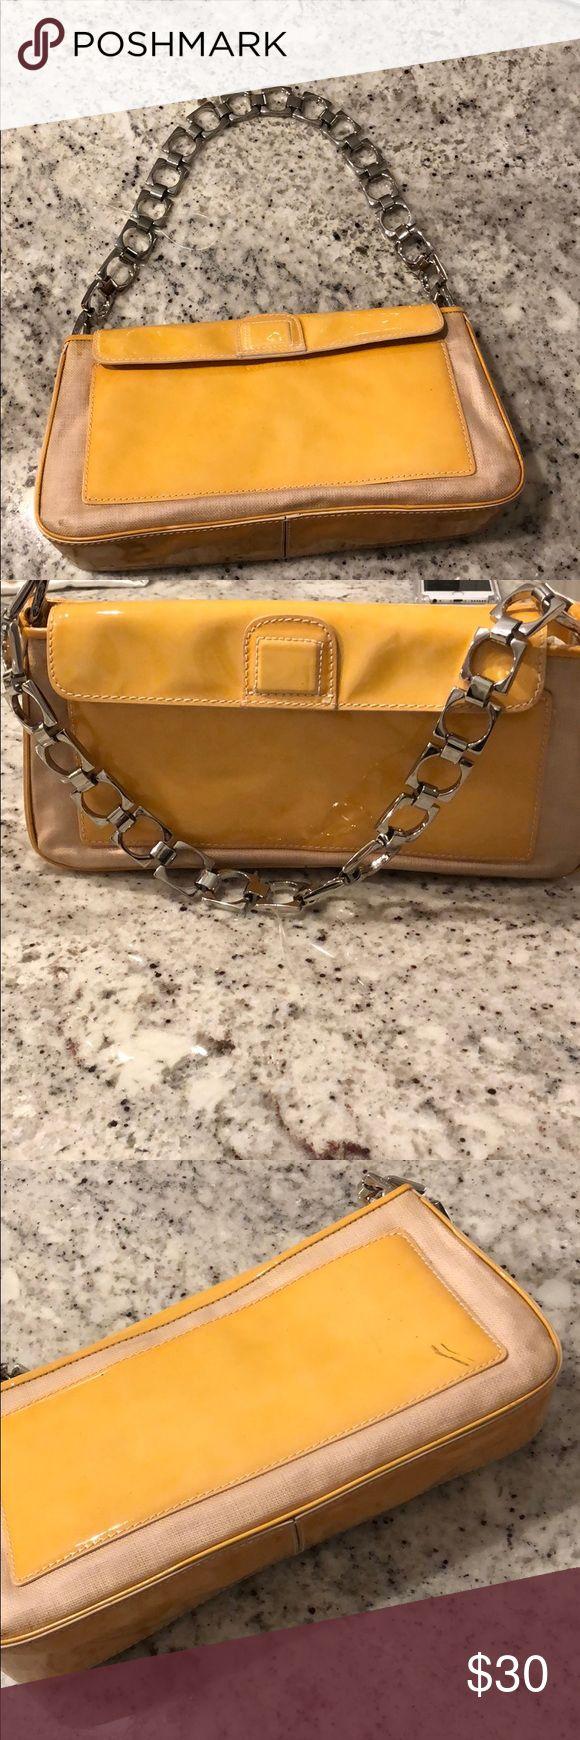 Retro Cole Haan purse ⭐️NWT⭐️Yellow Vintage/Retro Cole Haan bag. Small scratch on back. Cole Haan Bags Shoulder Bags